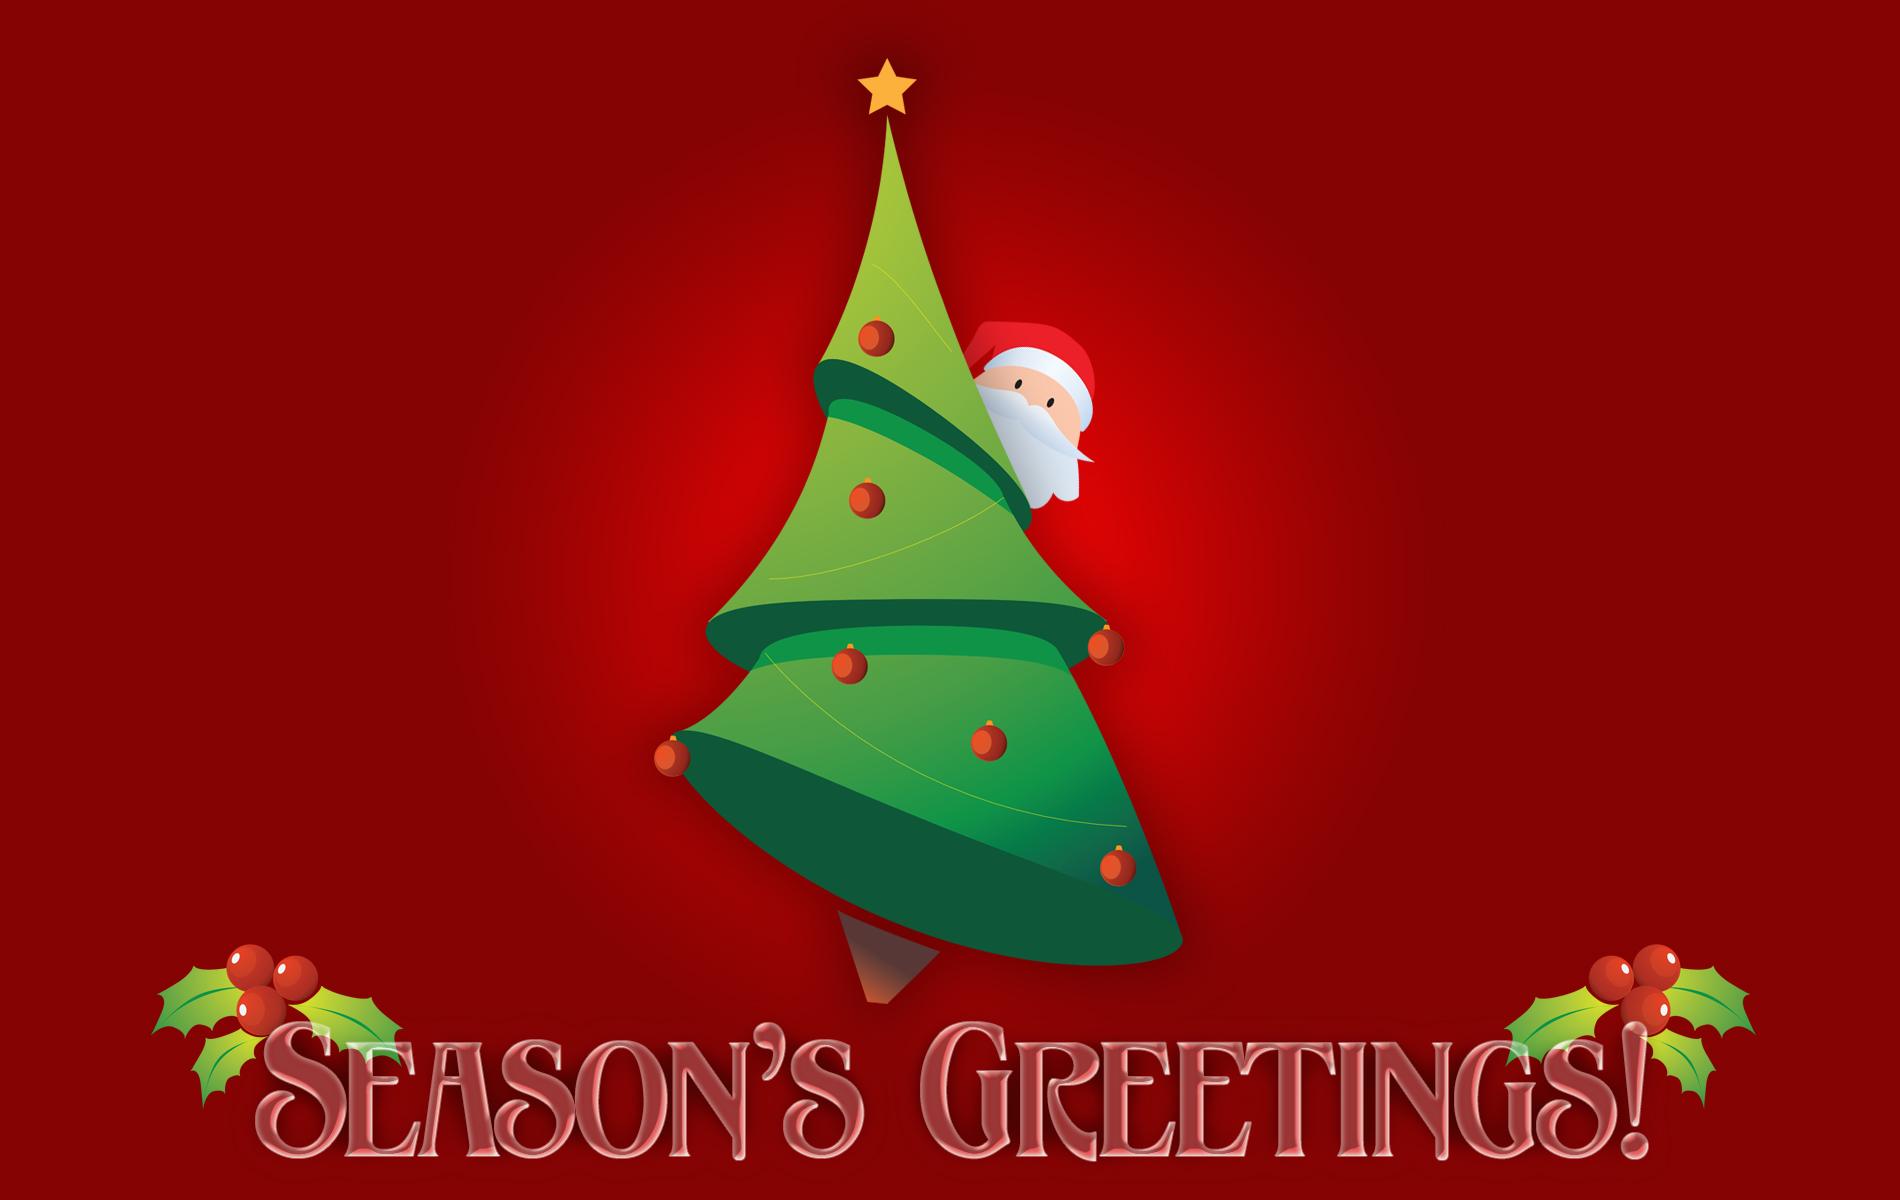 Christmas wallpaper x-mas by SD-Designs